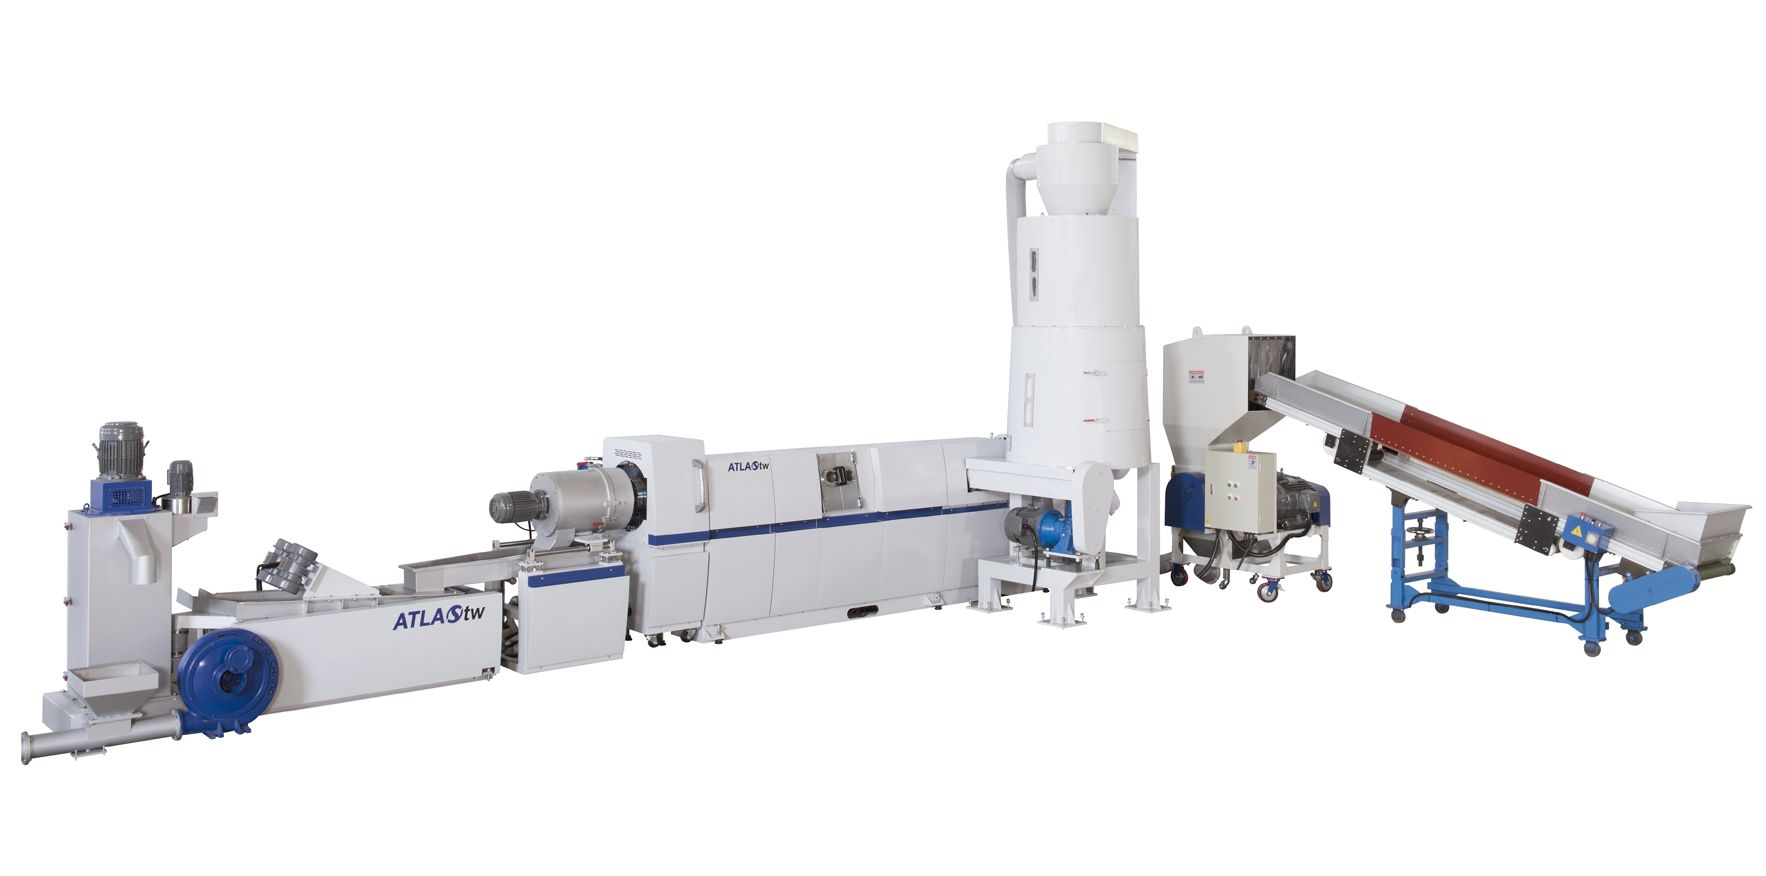 WPF-100 آلة إعادة تدوير البلاستيك وتكوير التغذية الجانبية